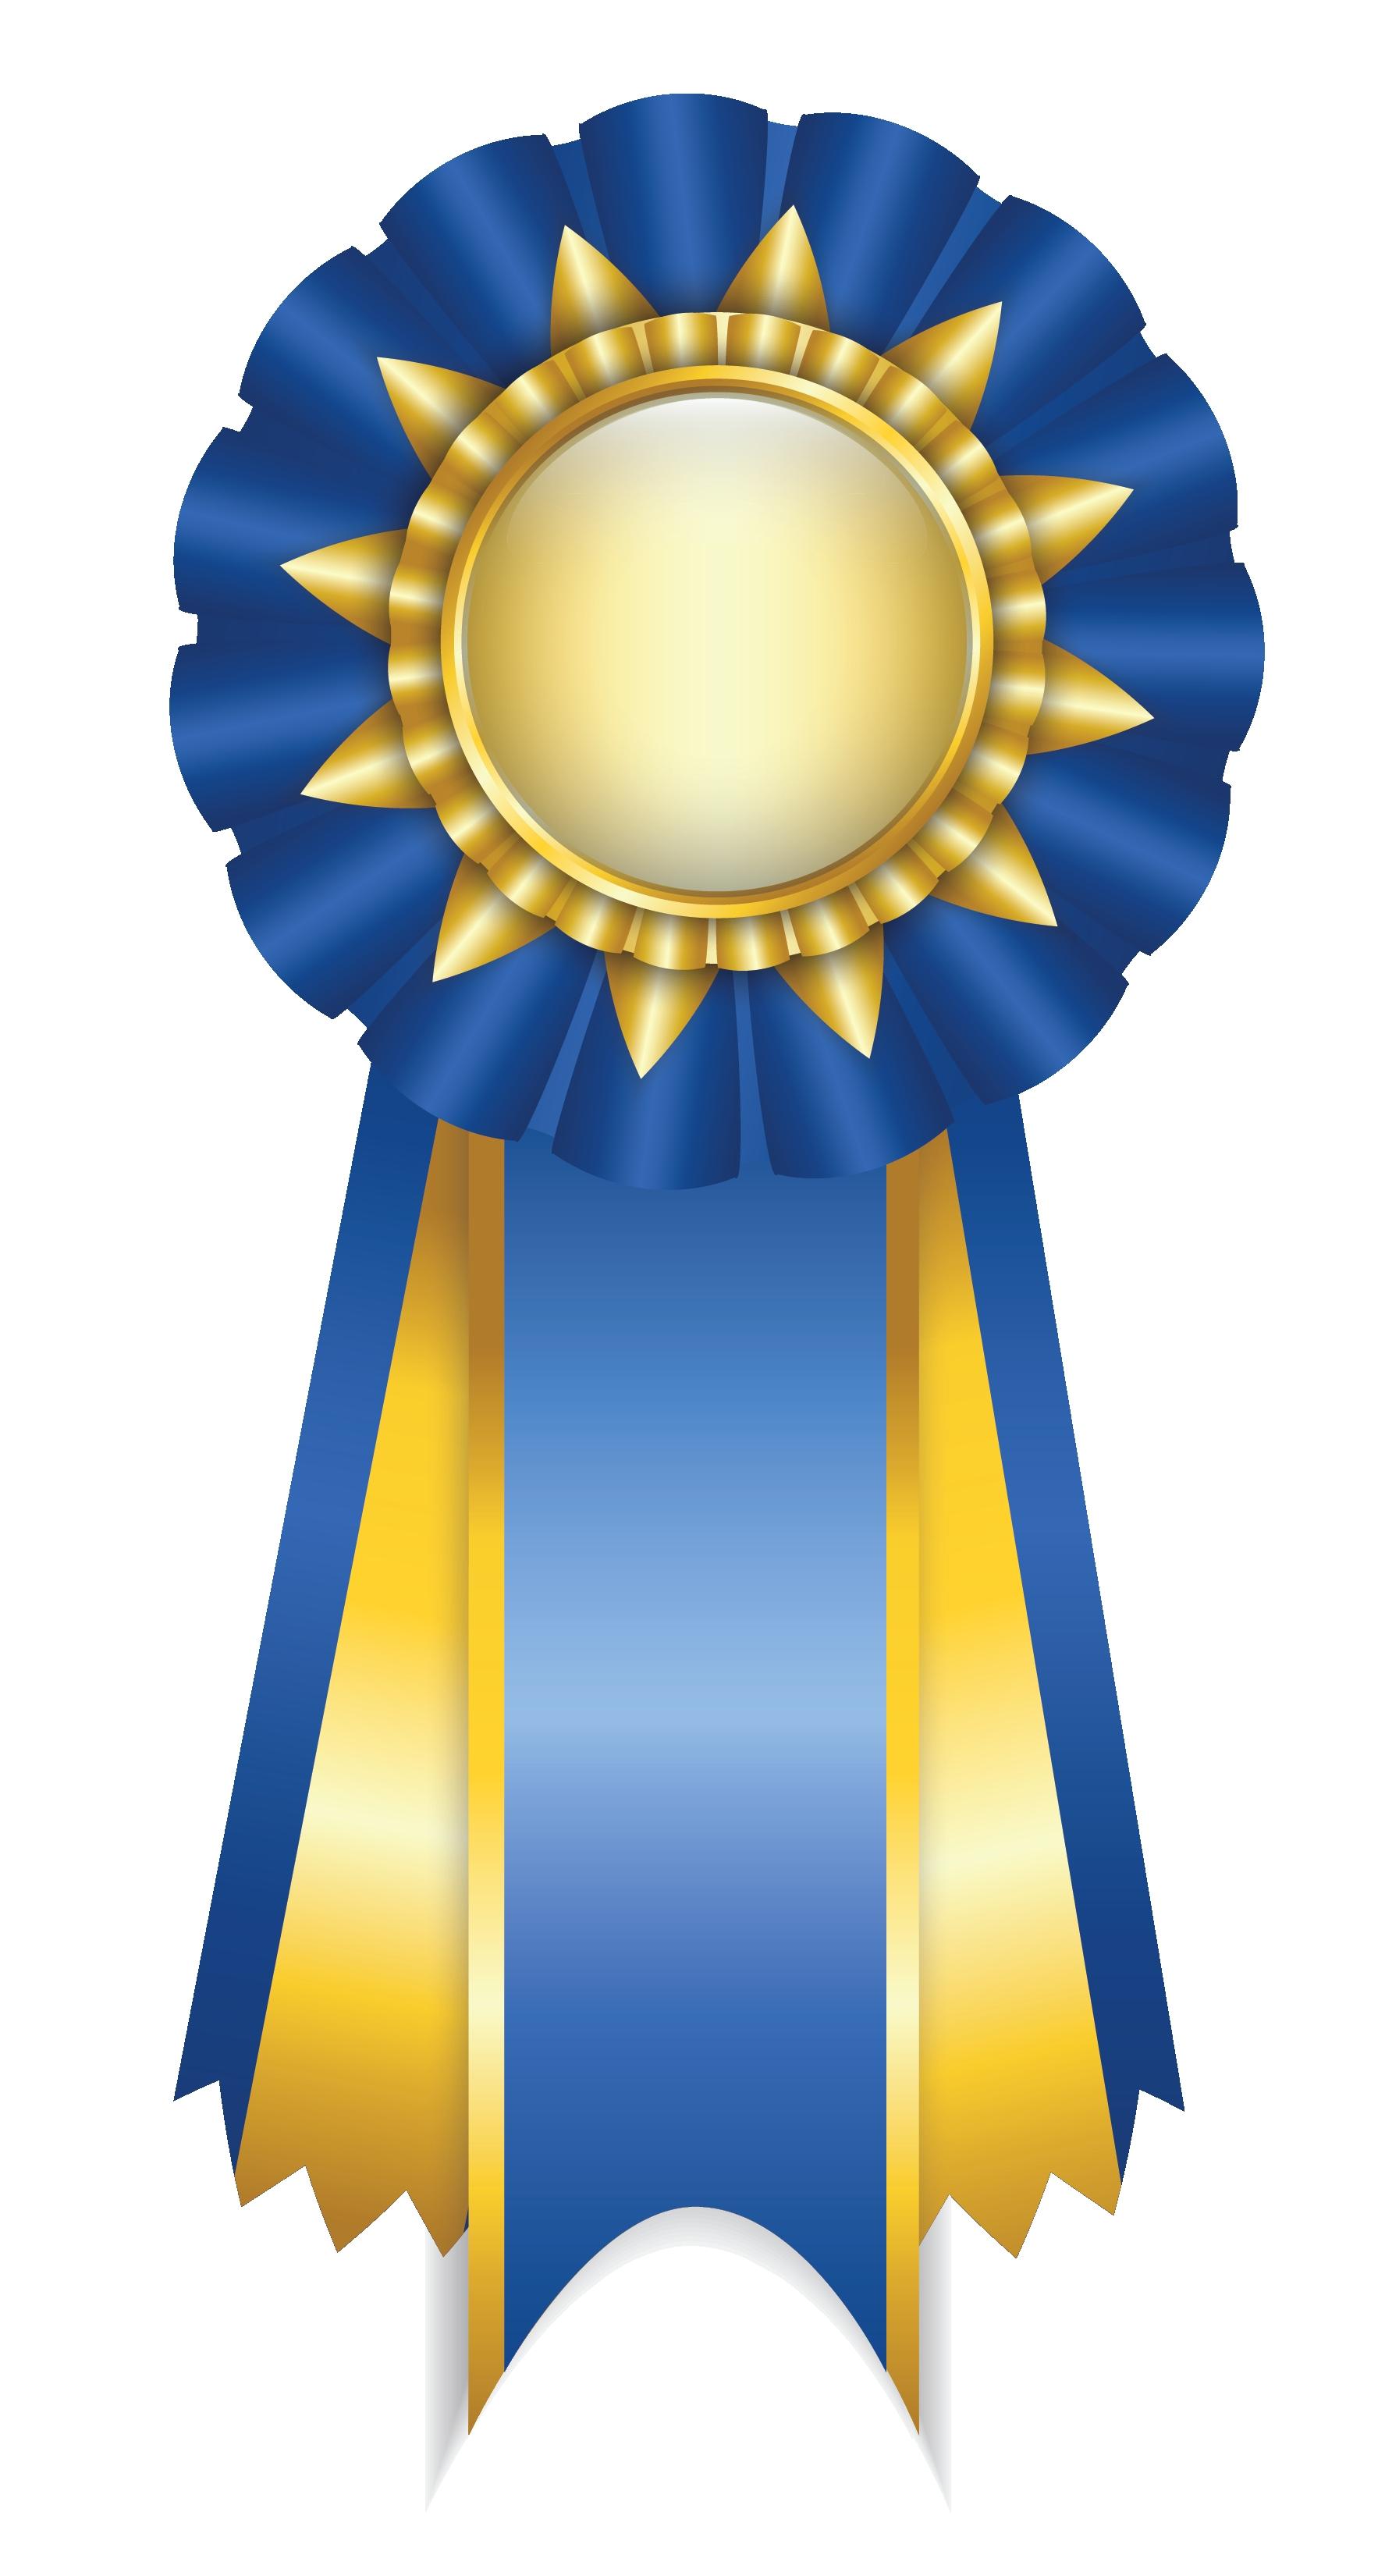 award clipart - 15 - o - Blue Ribbon Award Clipart 21